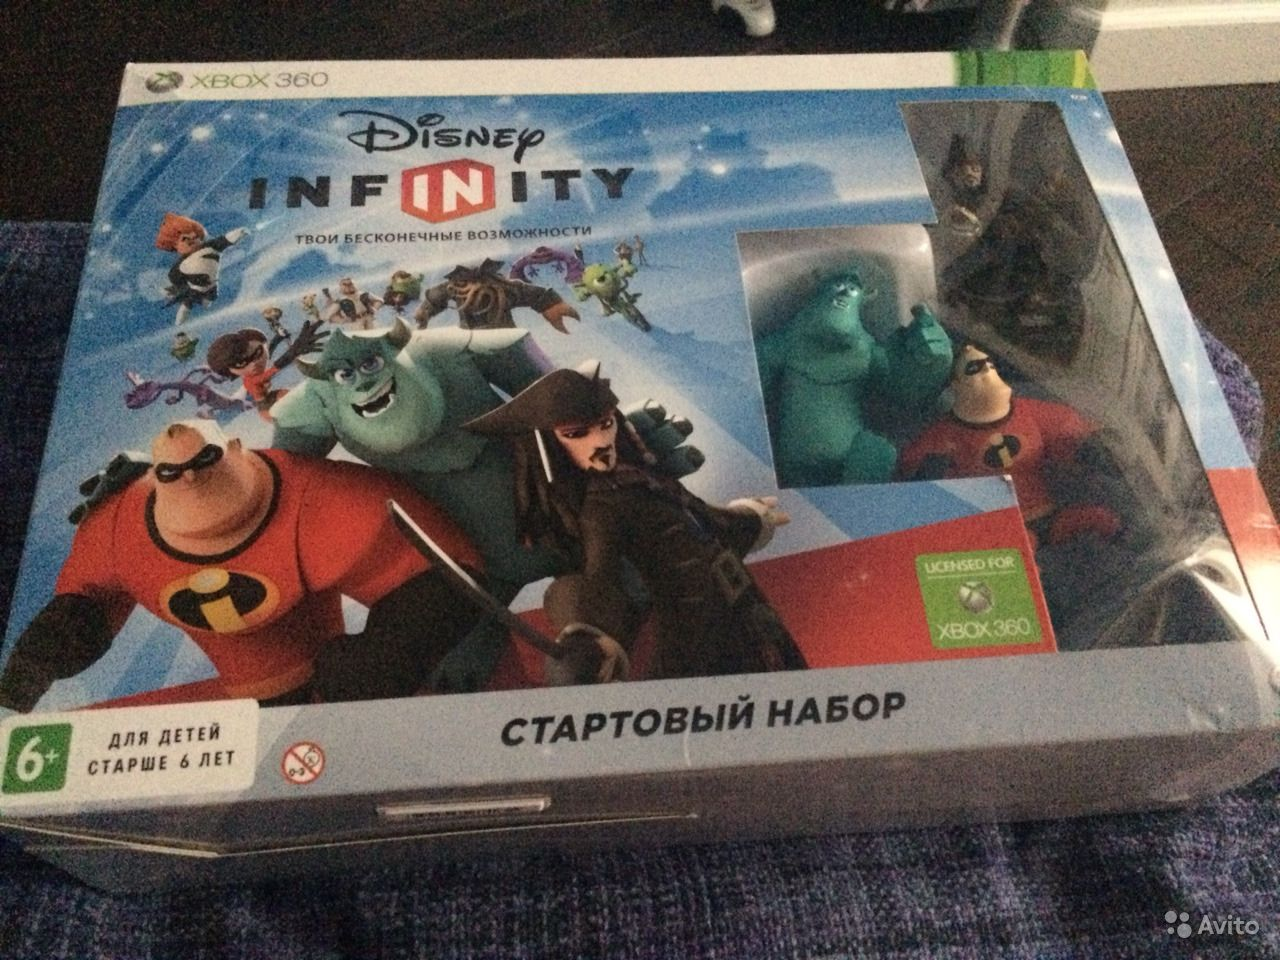 disney infinity xbox 360 - HD1280×960